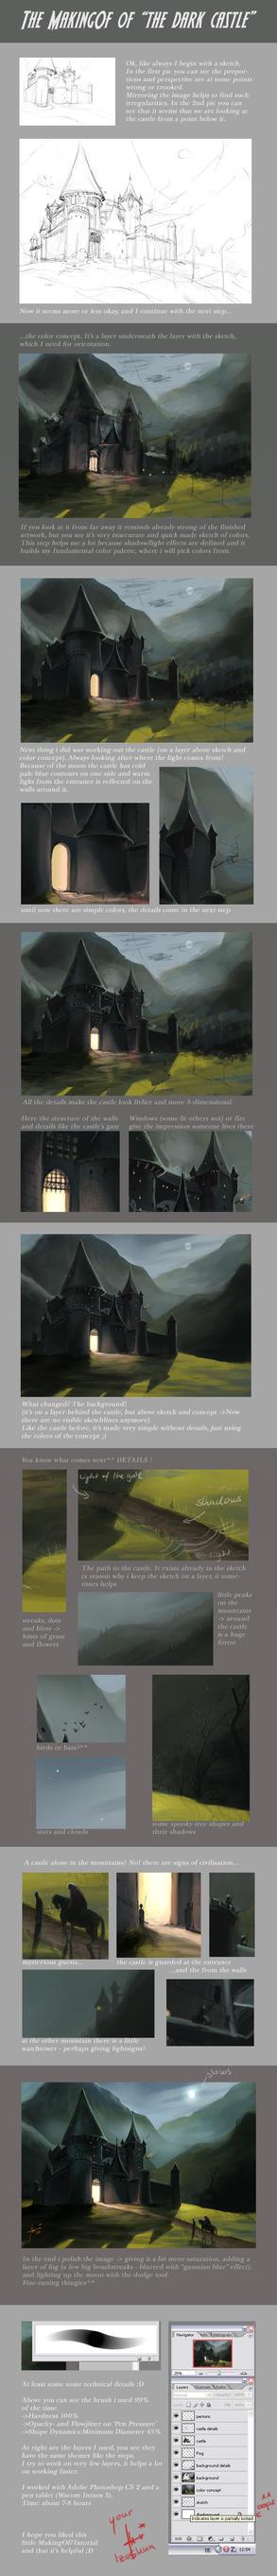 MakingOf - the dark castle by Izaskun